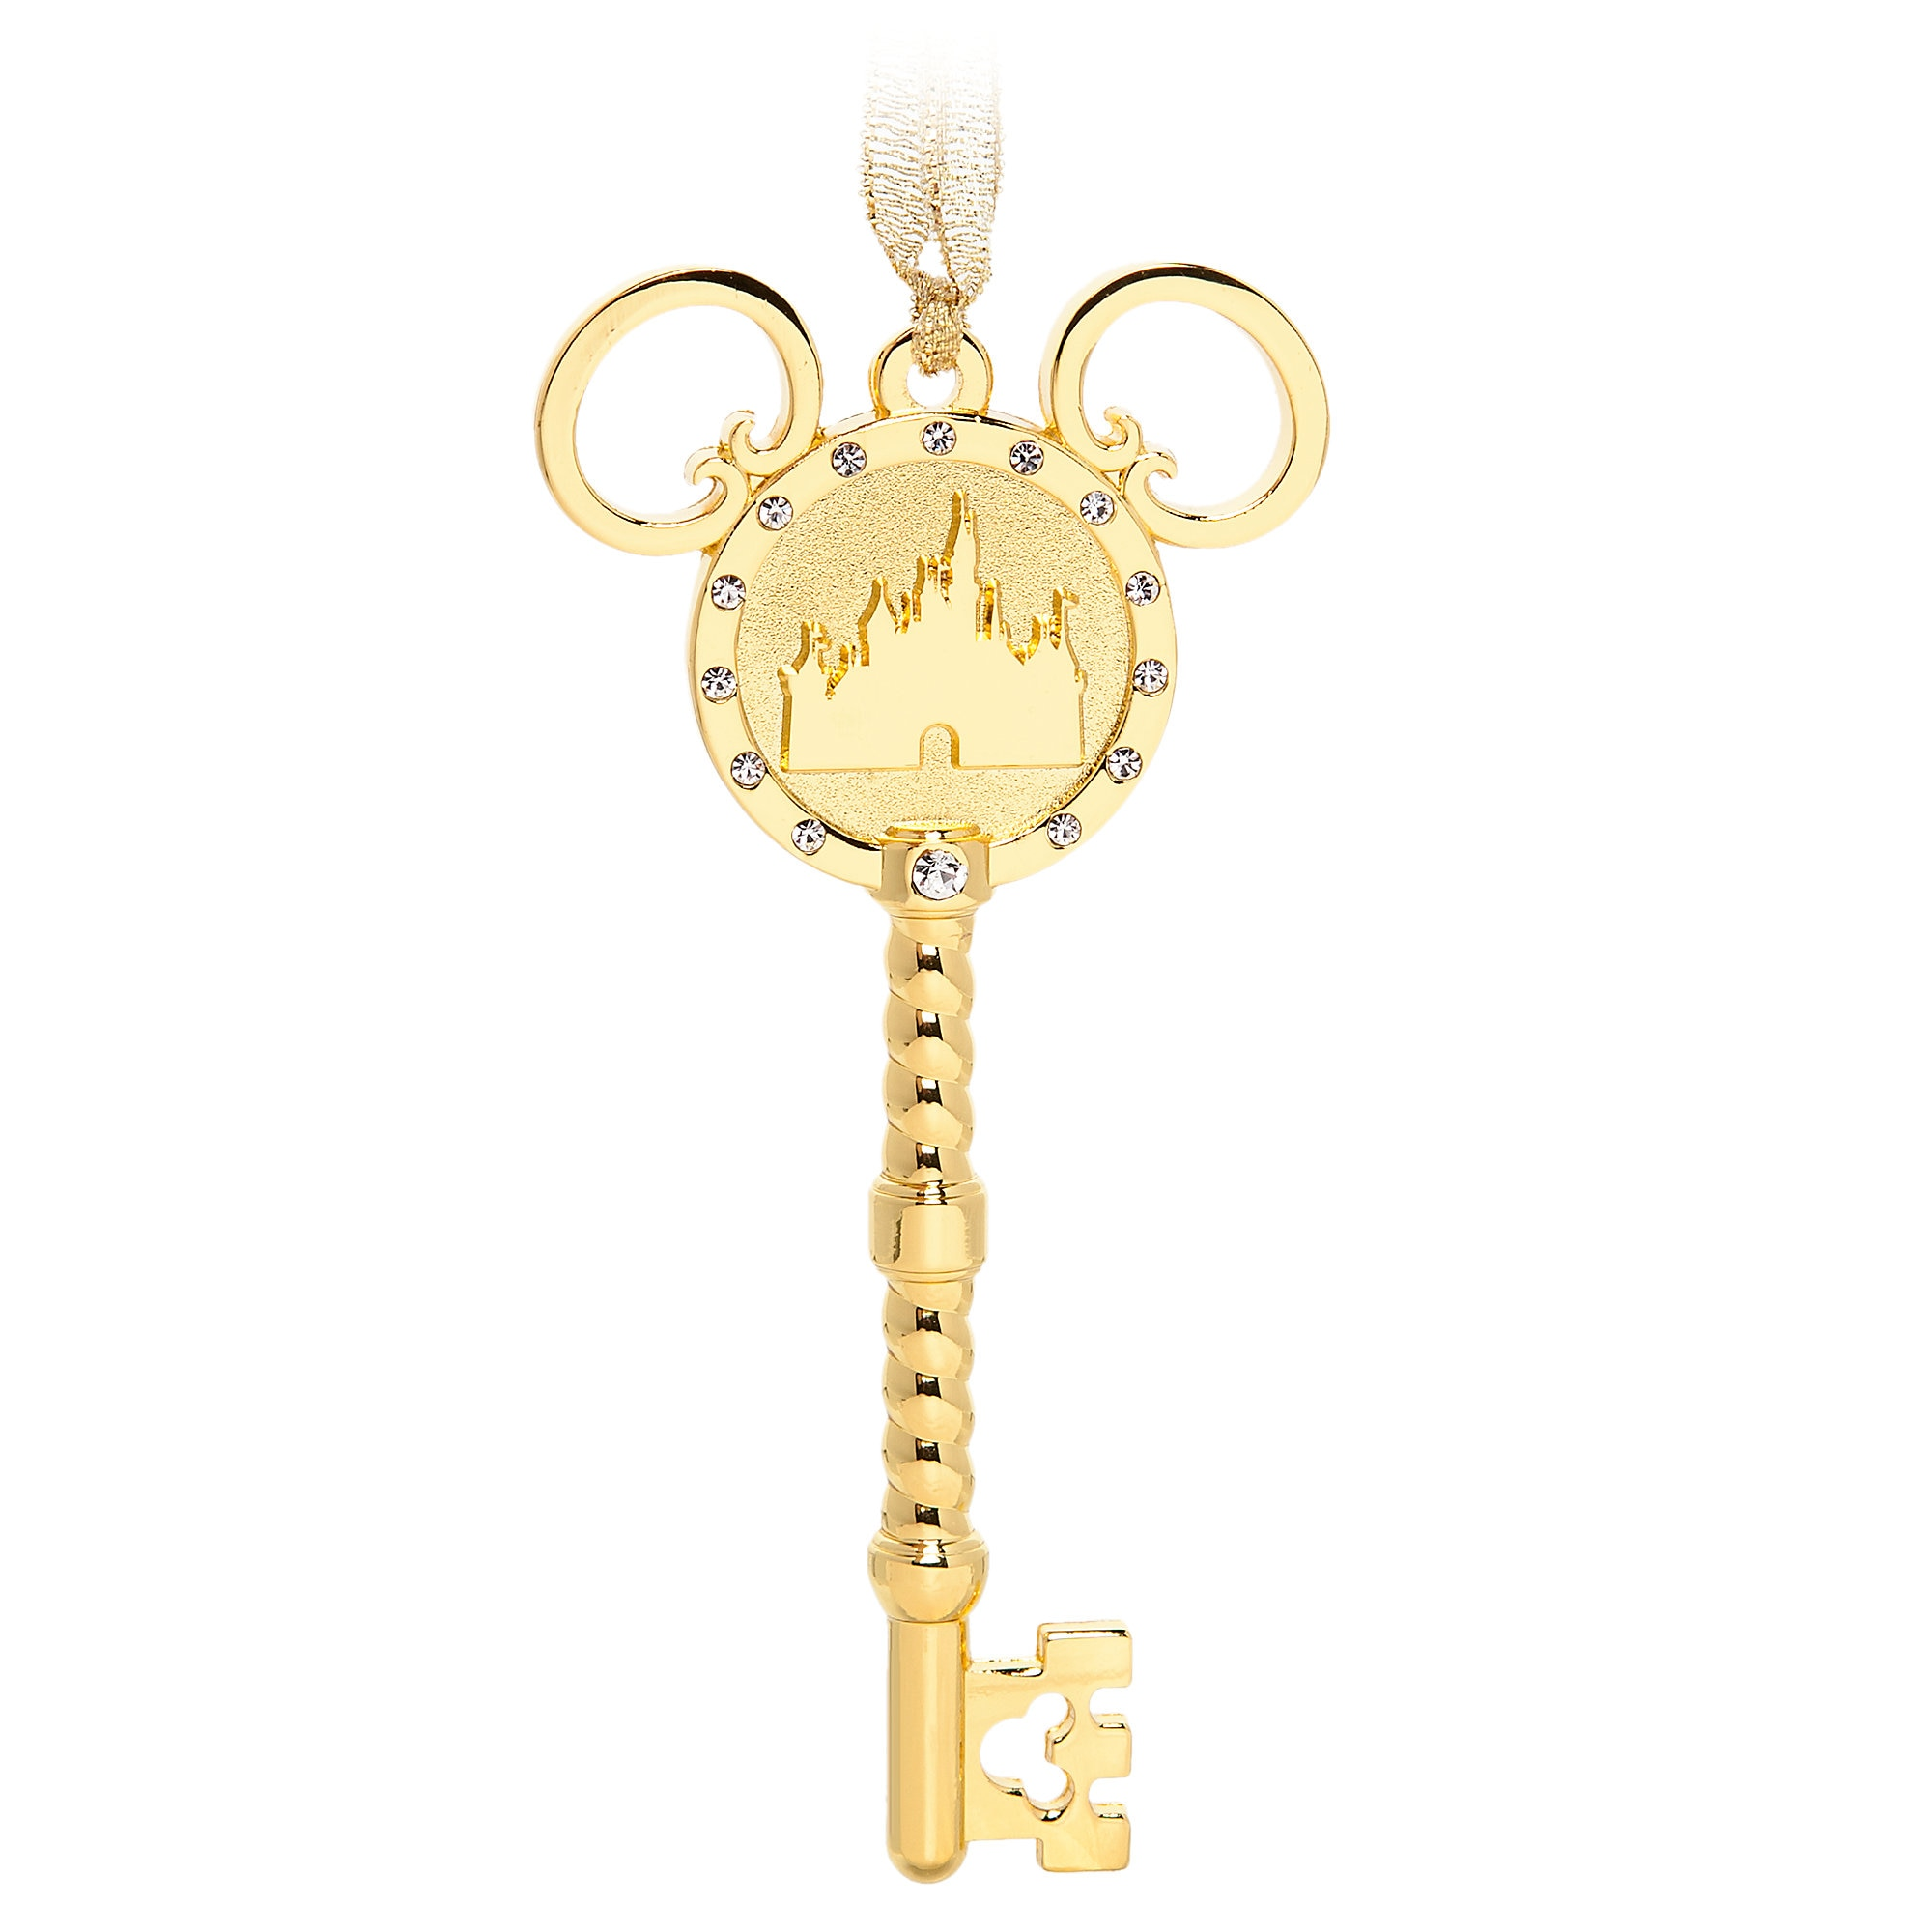 Disneyland Key Ornament